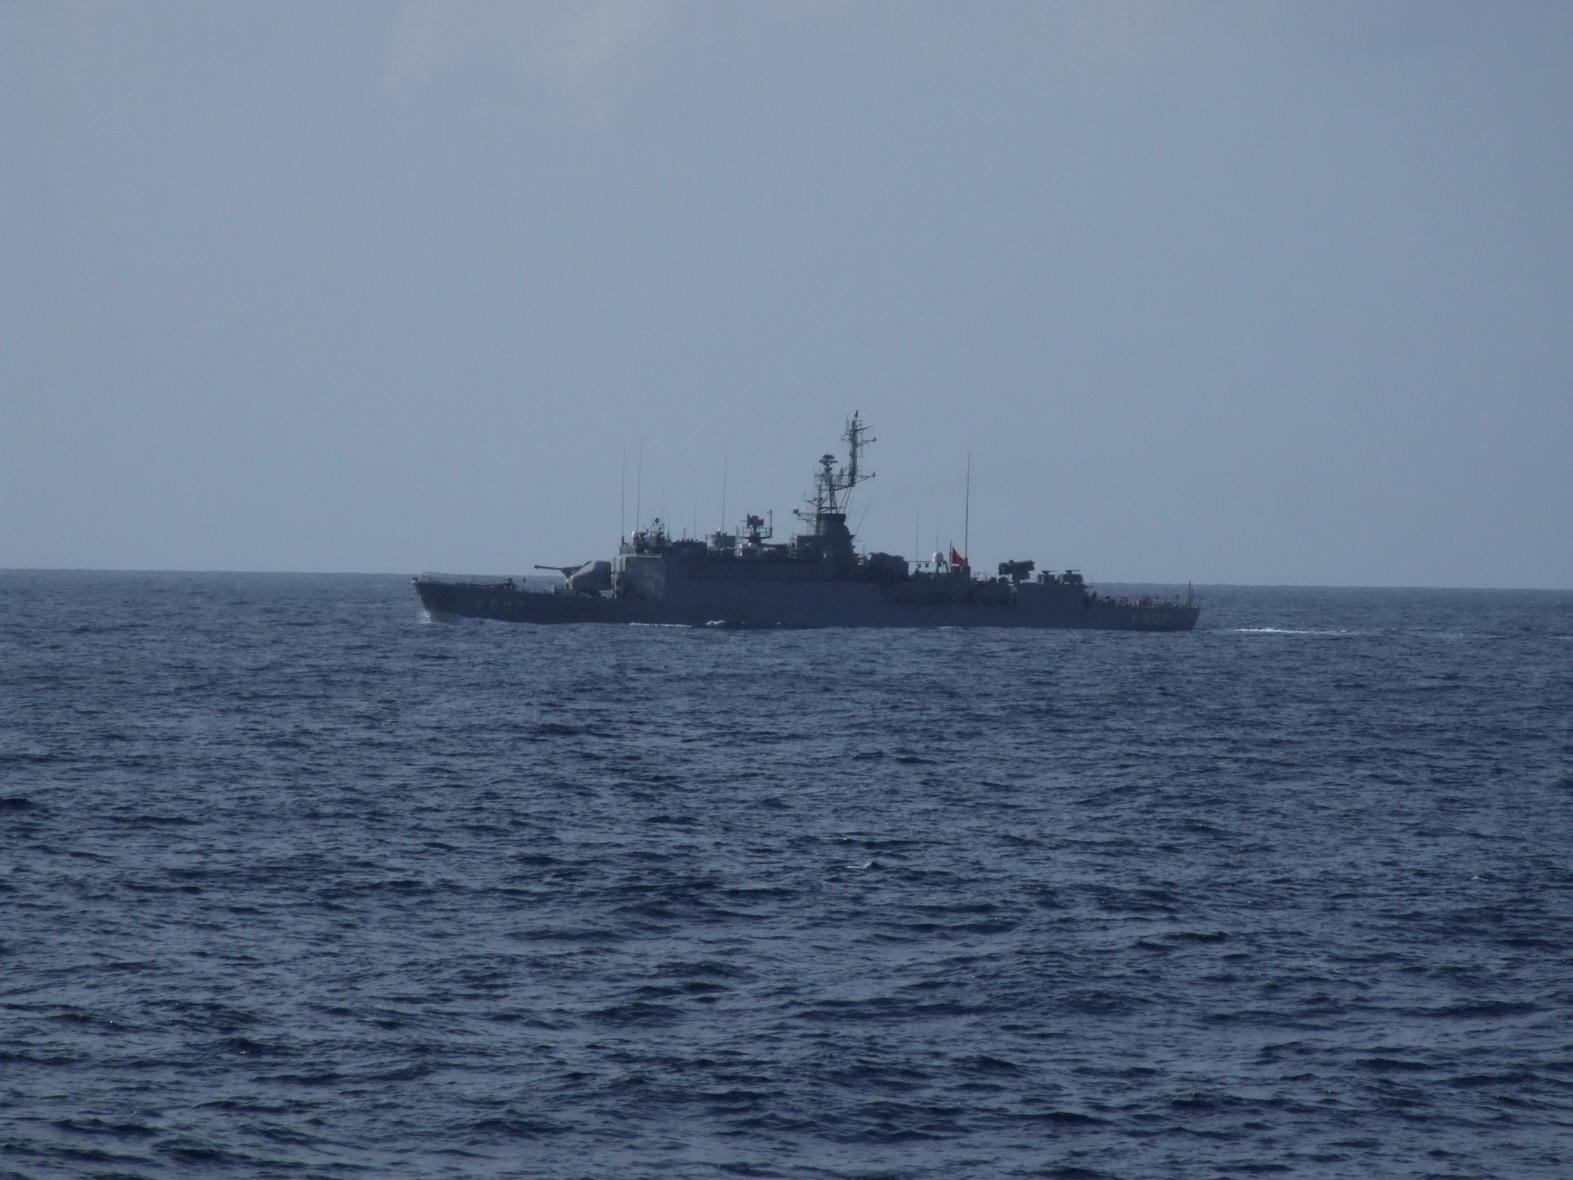 Turkish warship01.jpg